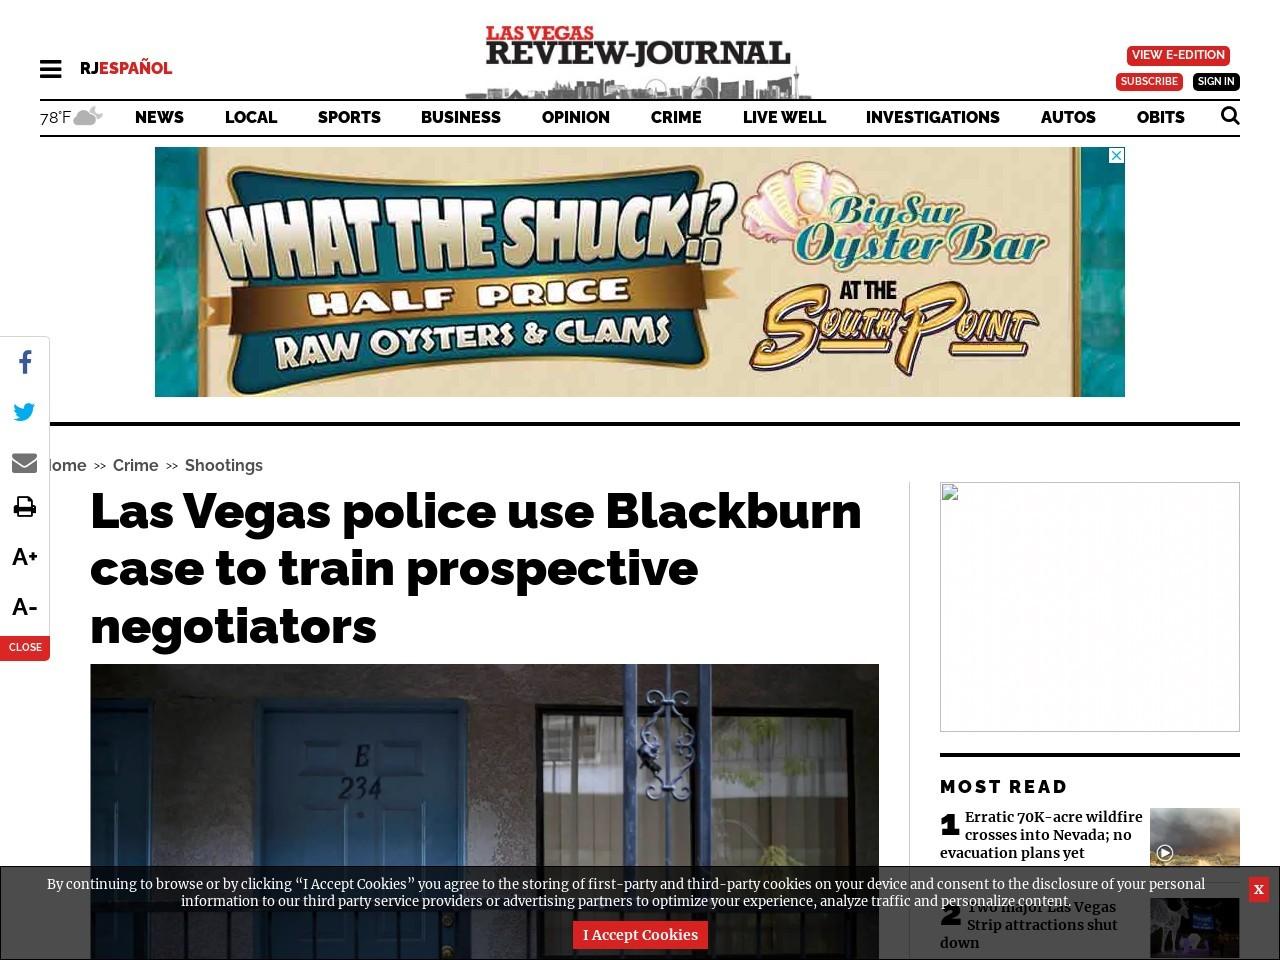 Las Vegas police use Blackburn case to train prospective negotiators